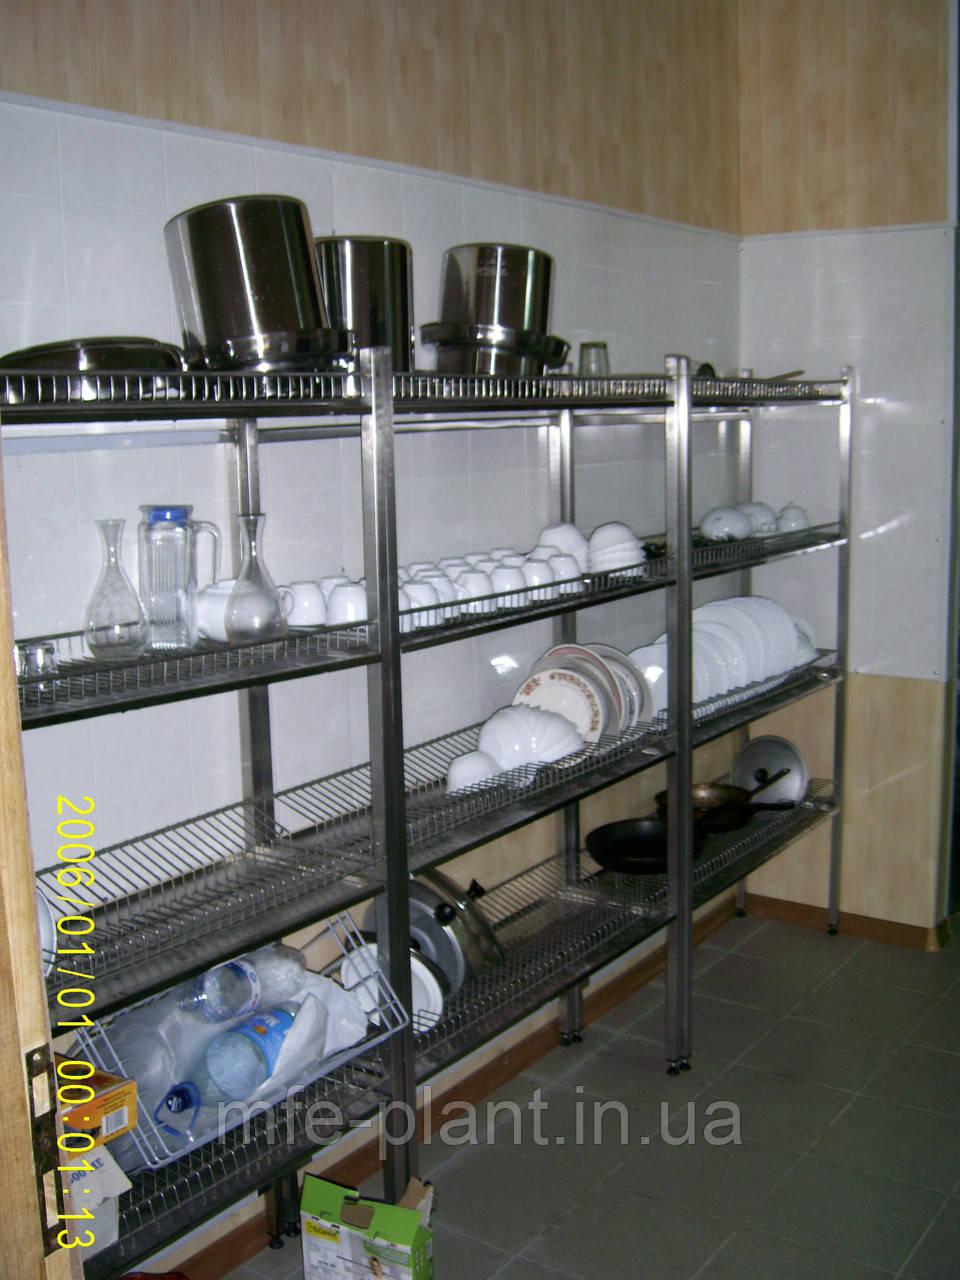 Стеллаж-сушка 1200х350х1700 из нержавейки(4 полки)